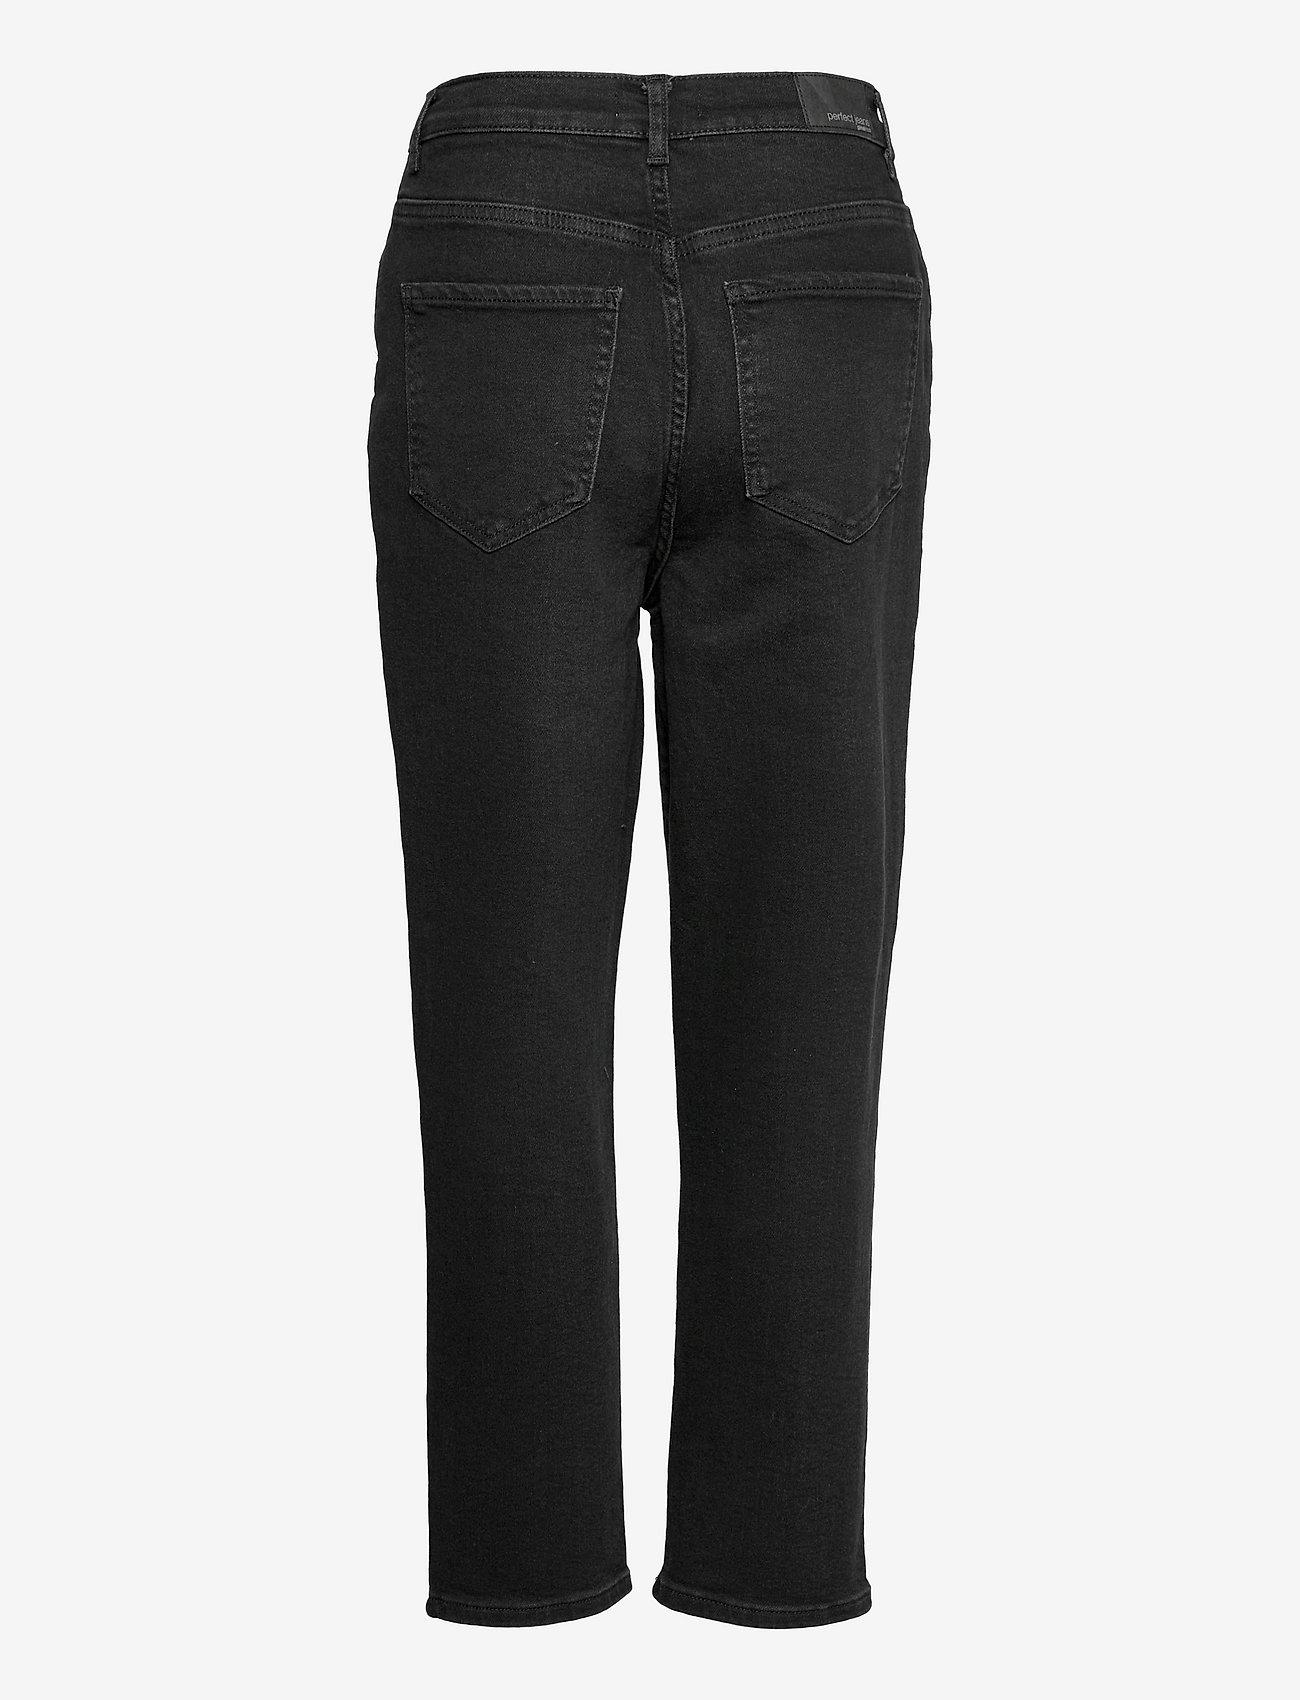 Gina Tricot - Comfy mom jeans - mom jeans - black (9000) - 1